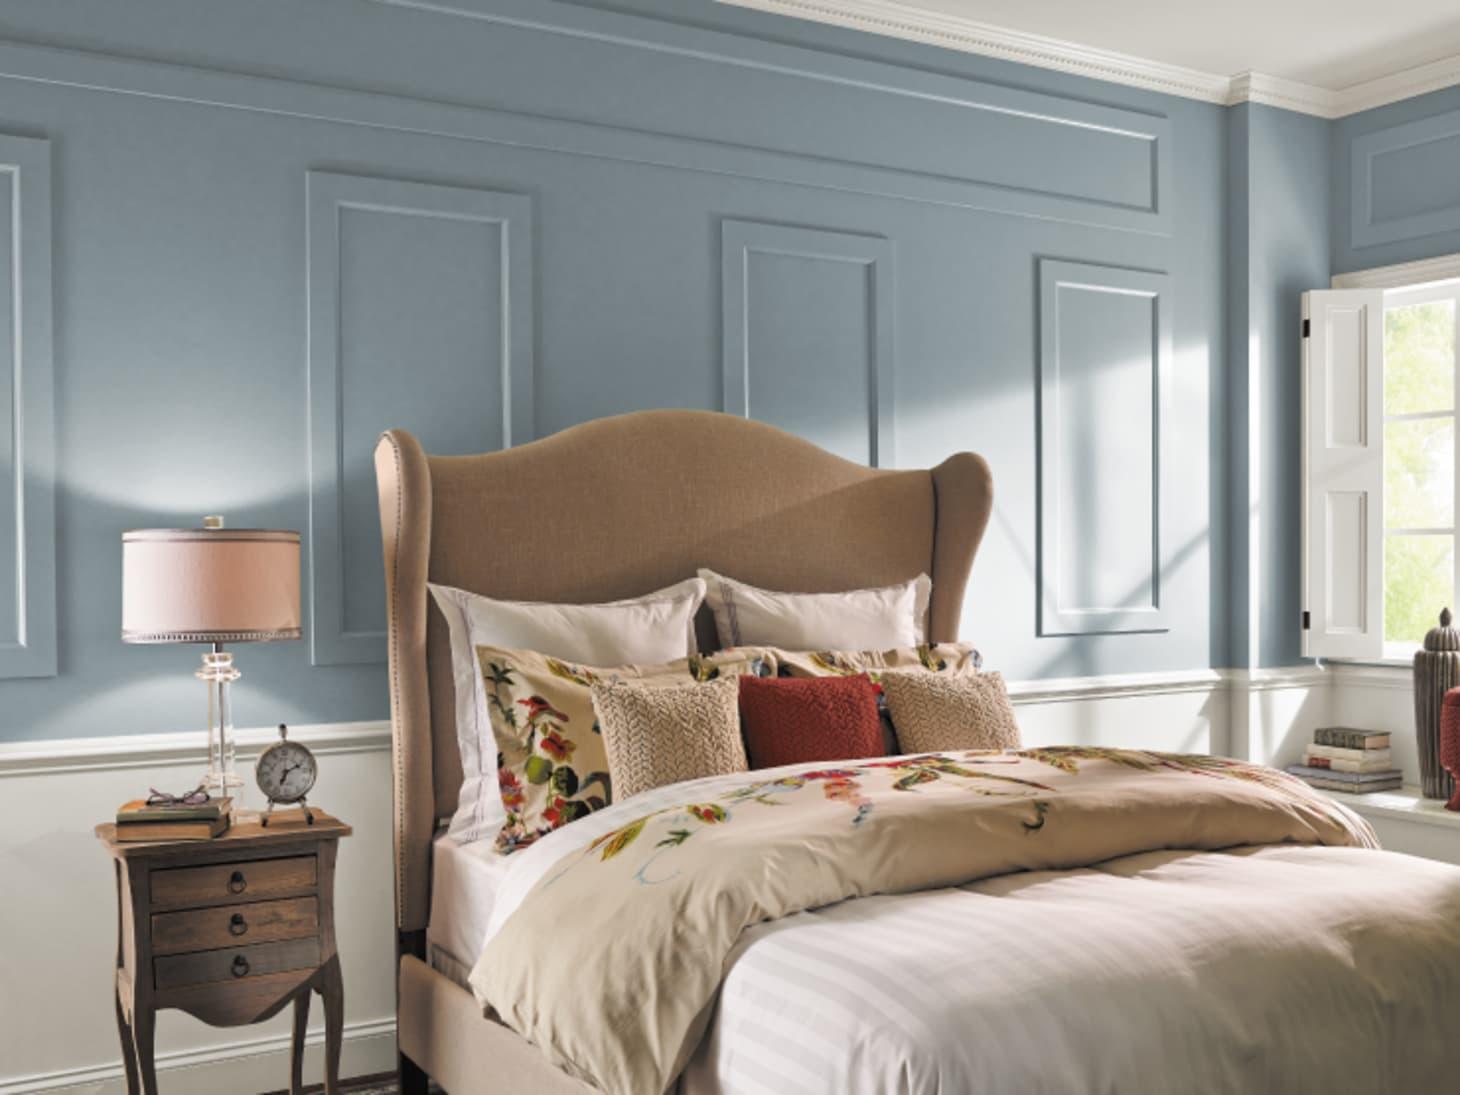 The best paint colors for modern farmhouse interiors - Farmhouse interior paint colors ...